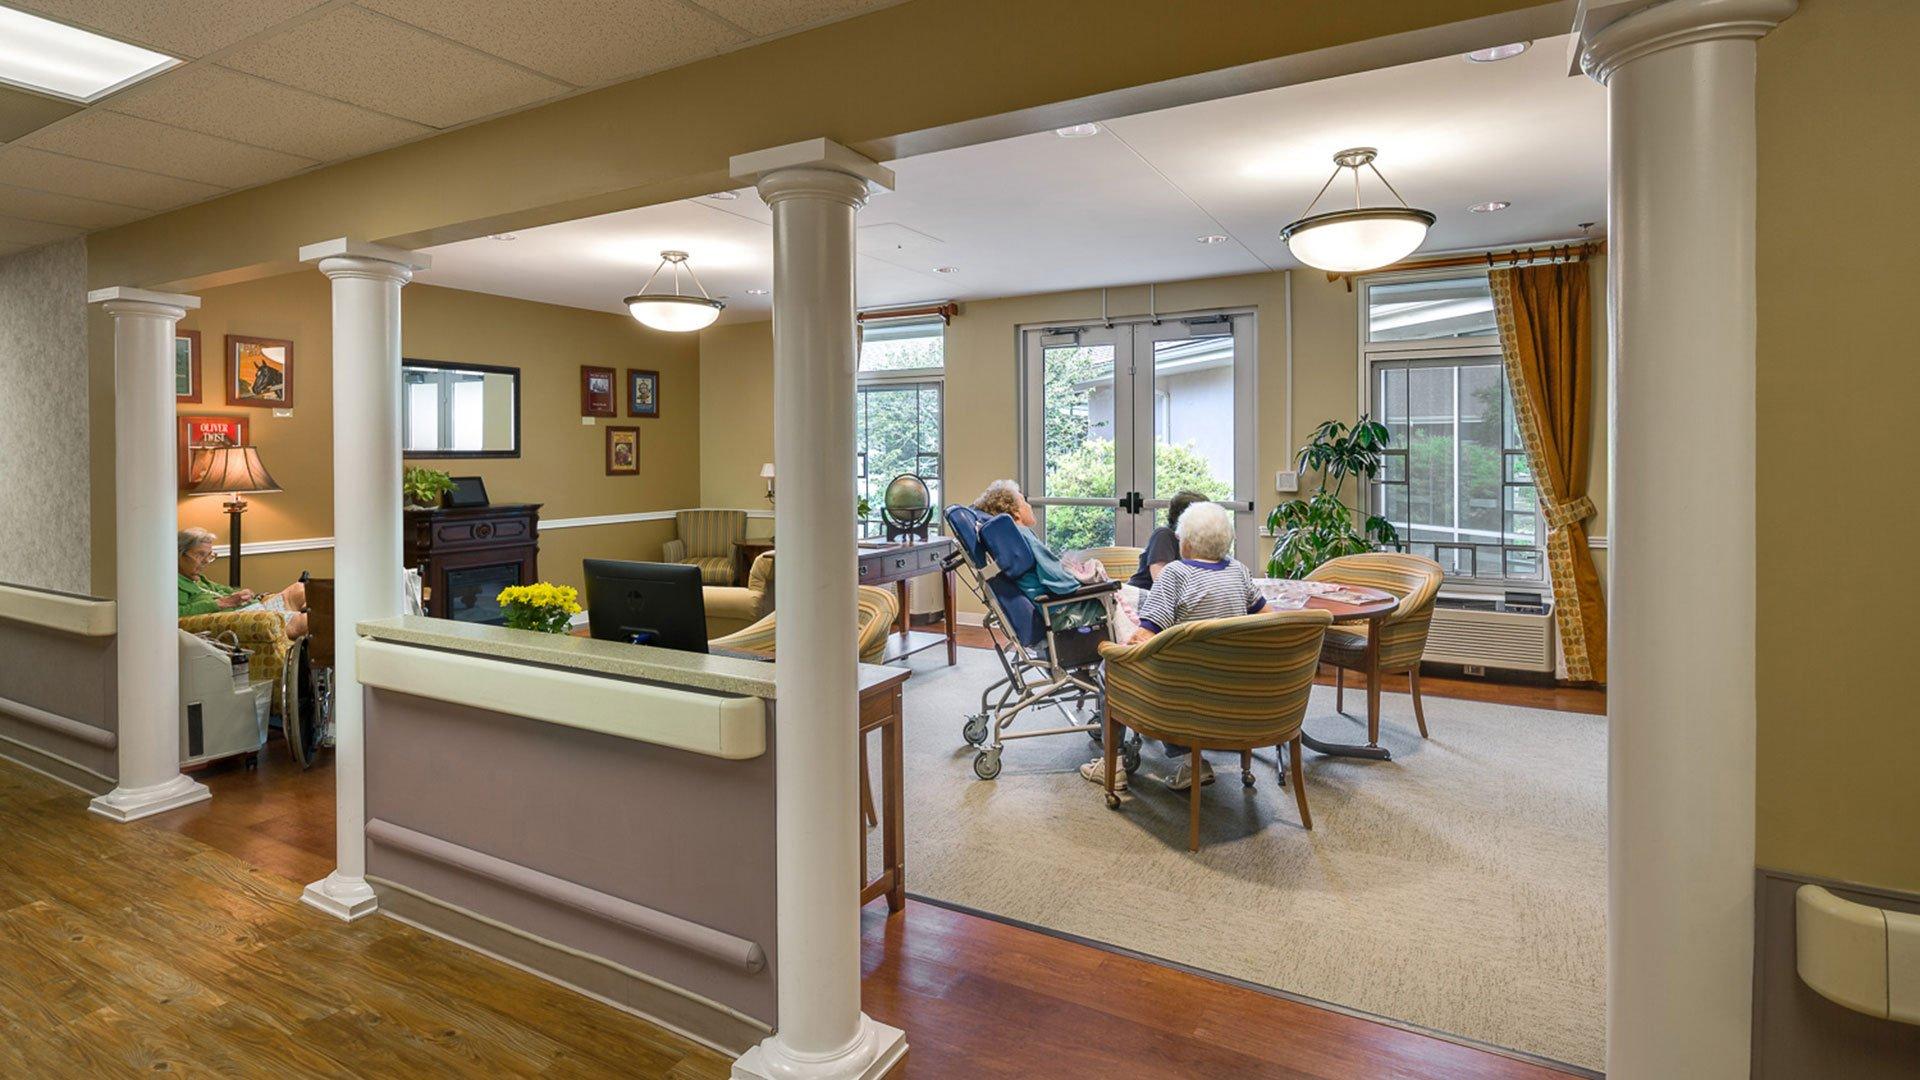 Mission Health, Eckerd Living Center